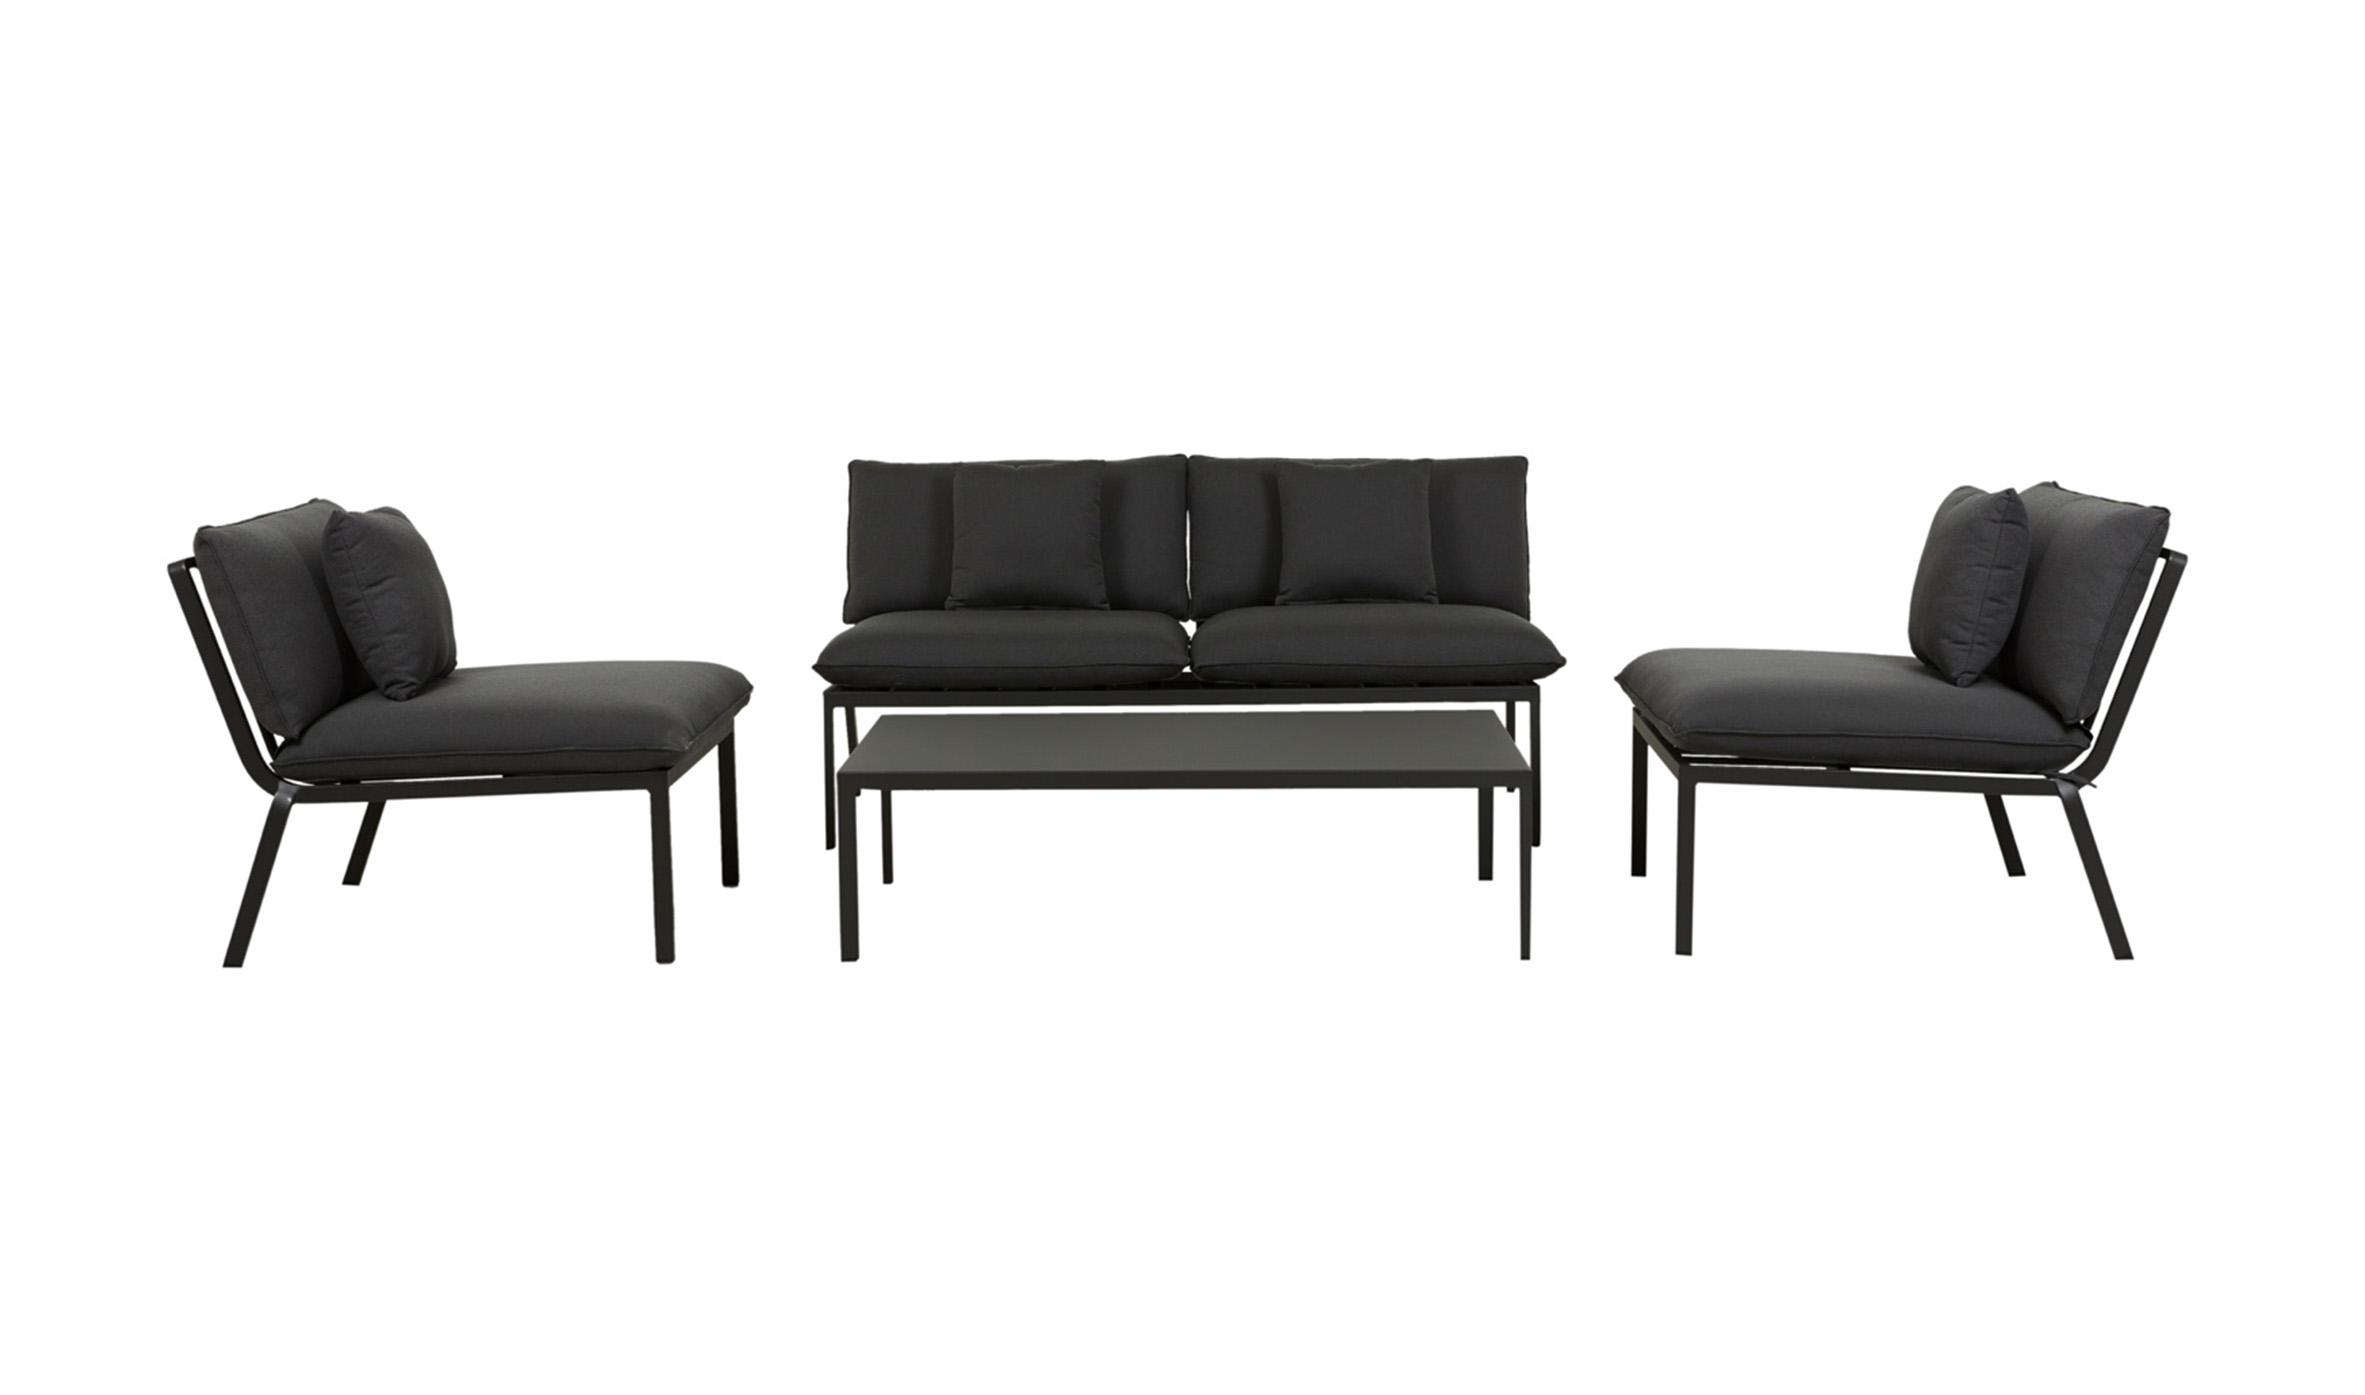 Furniture Thumbnails outdoor-sofas-pier-lounge